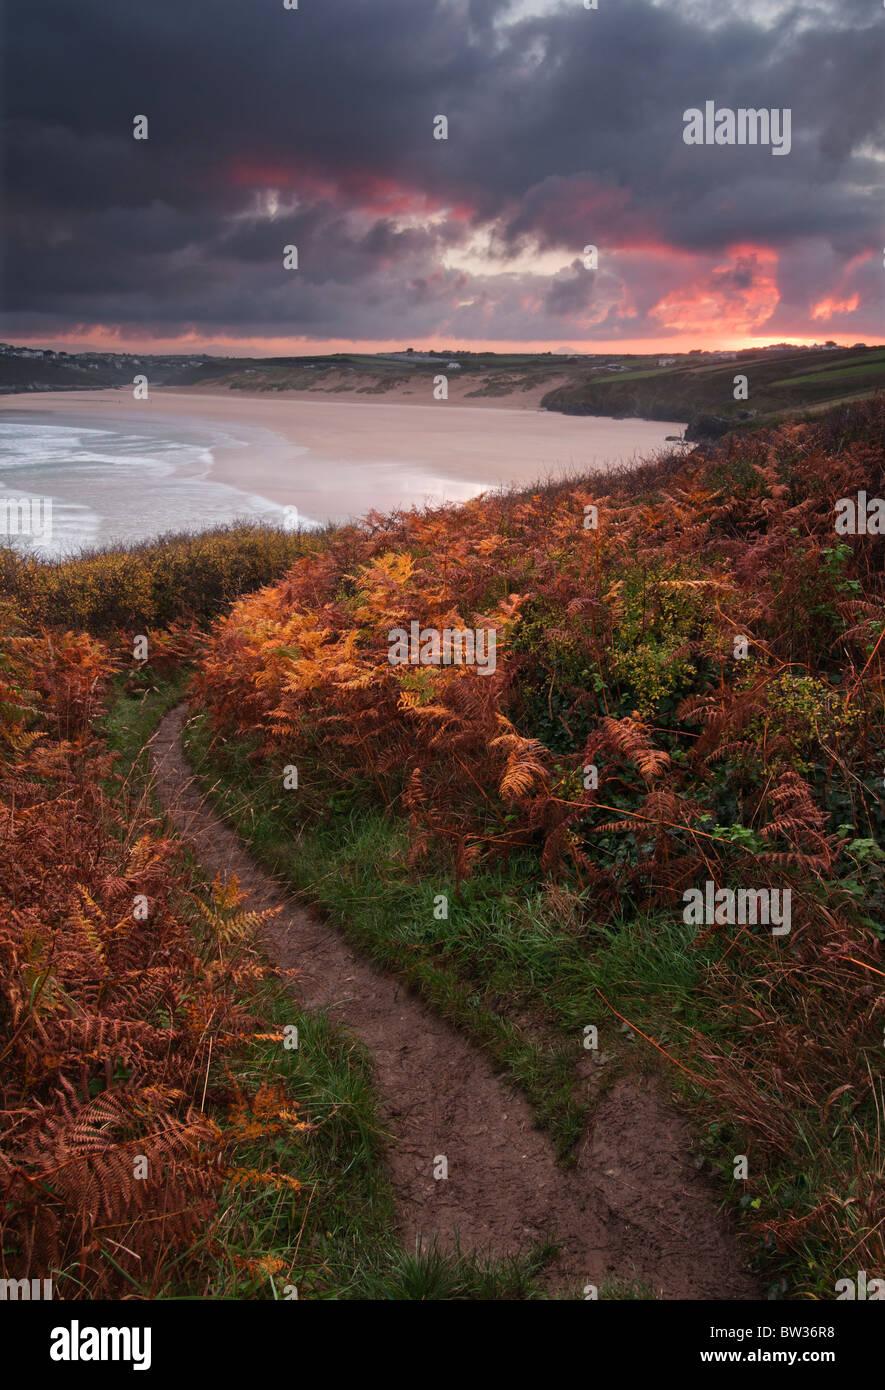 Autumn Sunrise over Crantock Bay near Newquay on the North Cornish coast - Stock Image